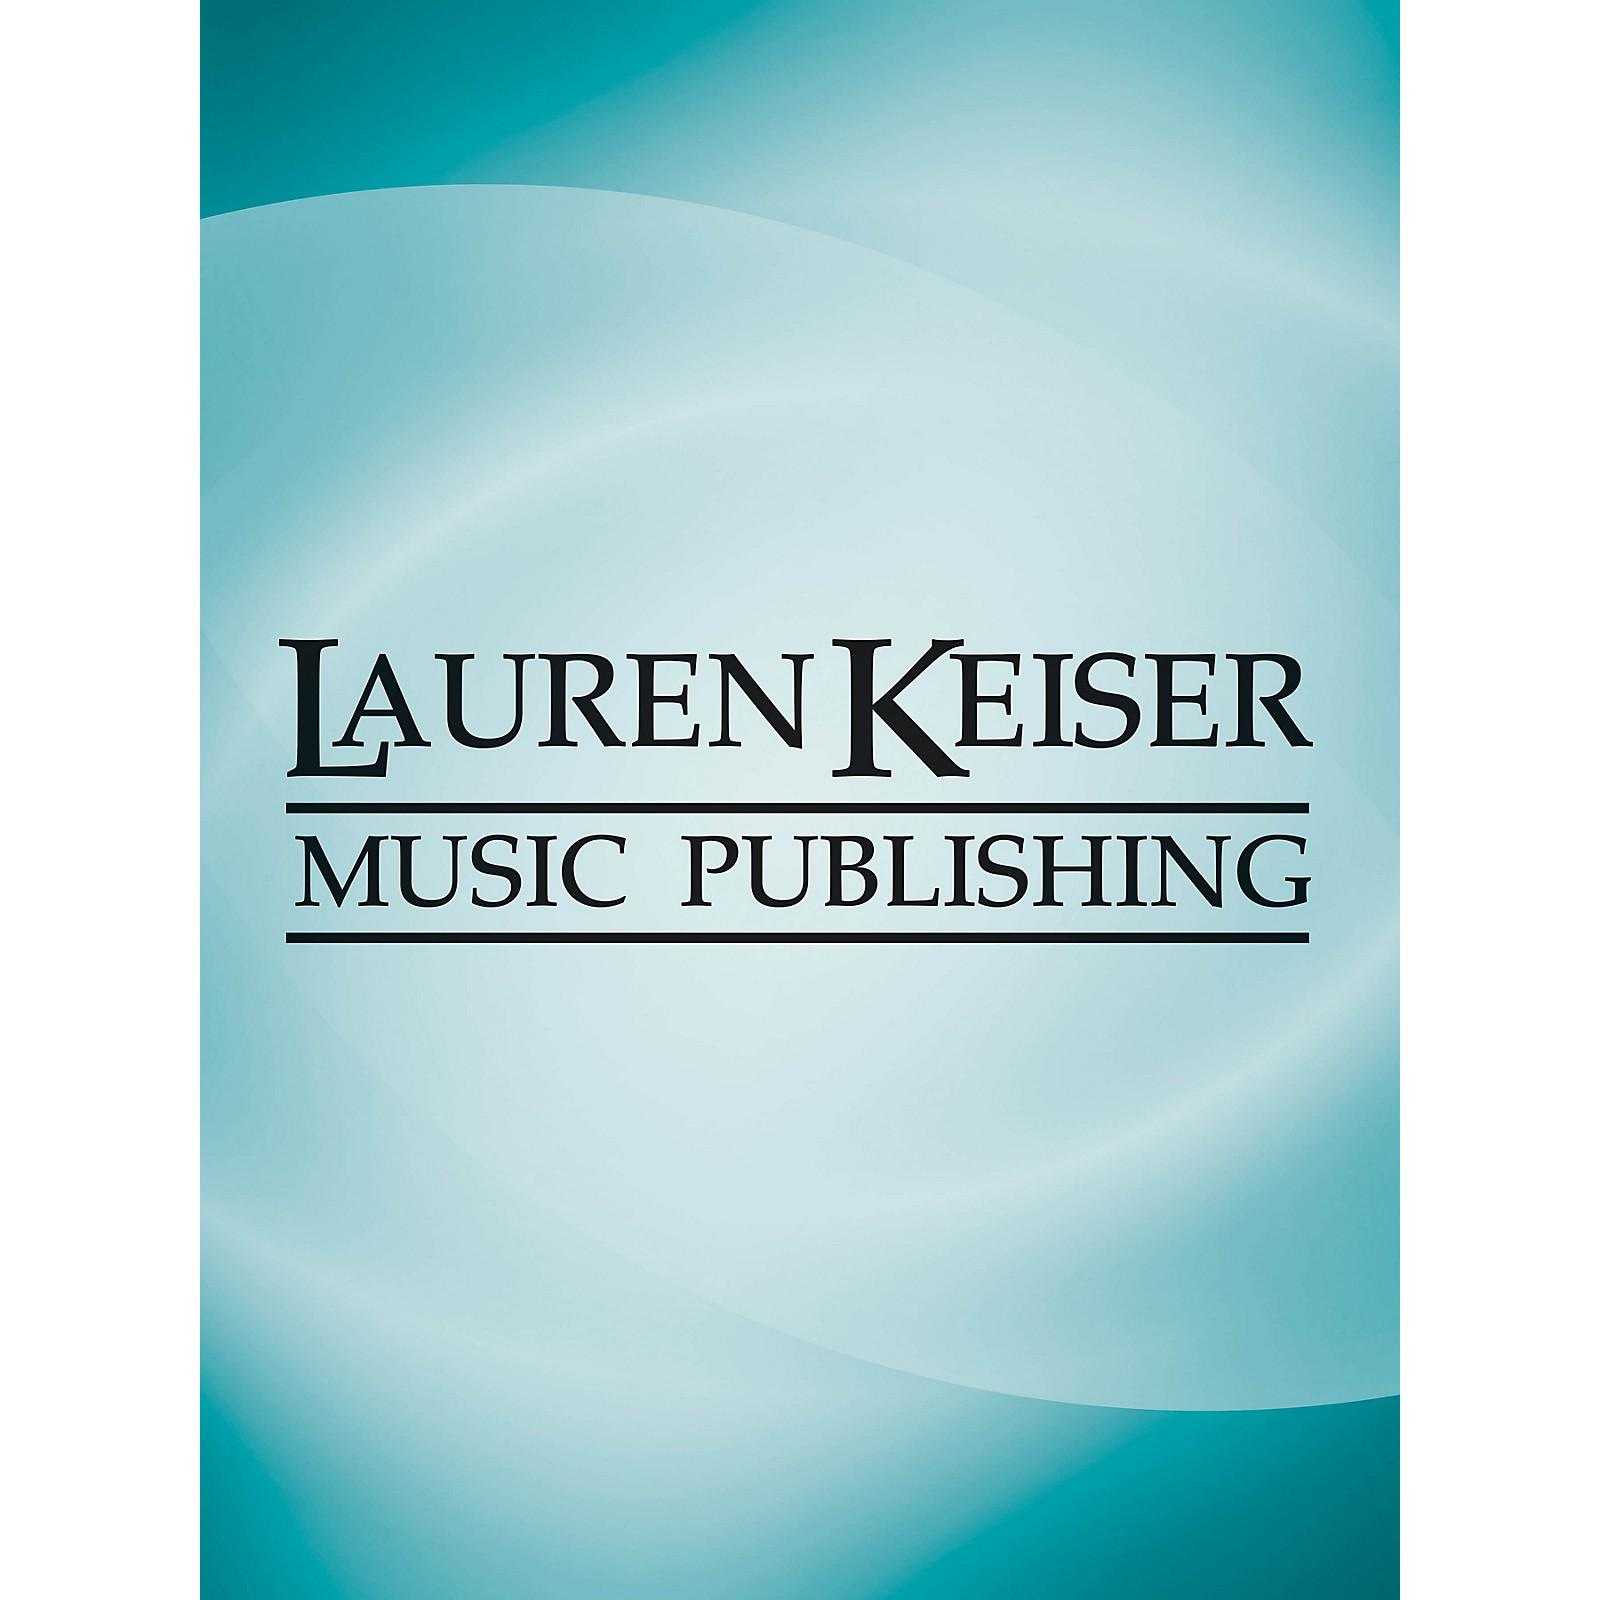 Lauren Keiser Music Publishing Sax Appeal (Saxophone Quartet) LKM Music Series  by David Stock